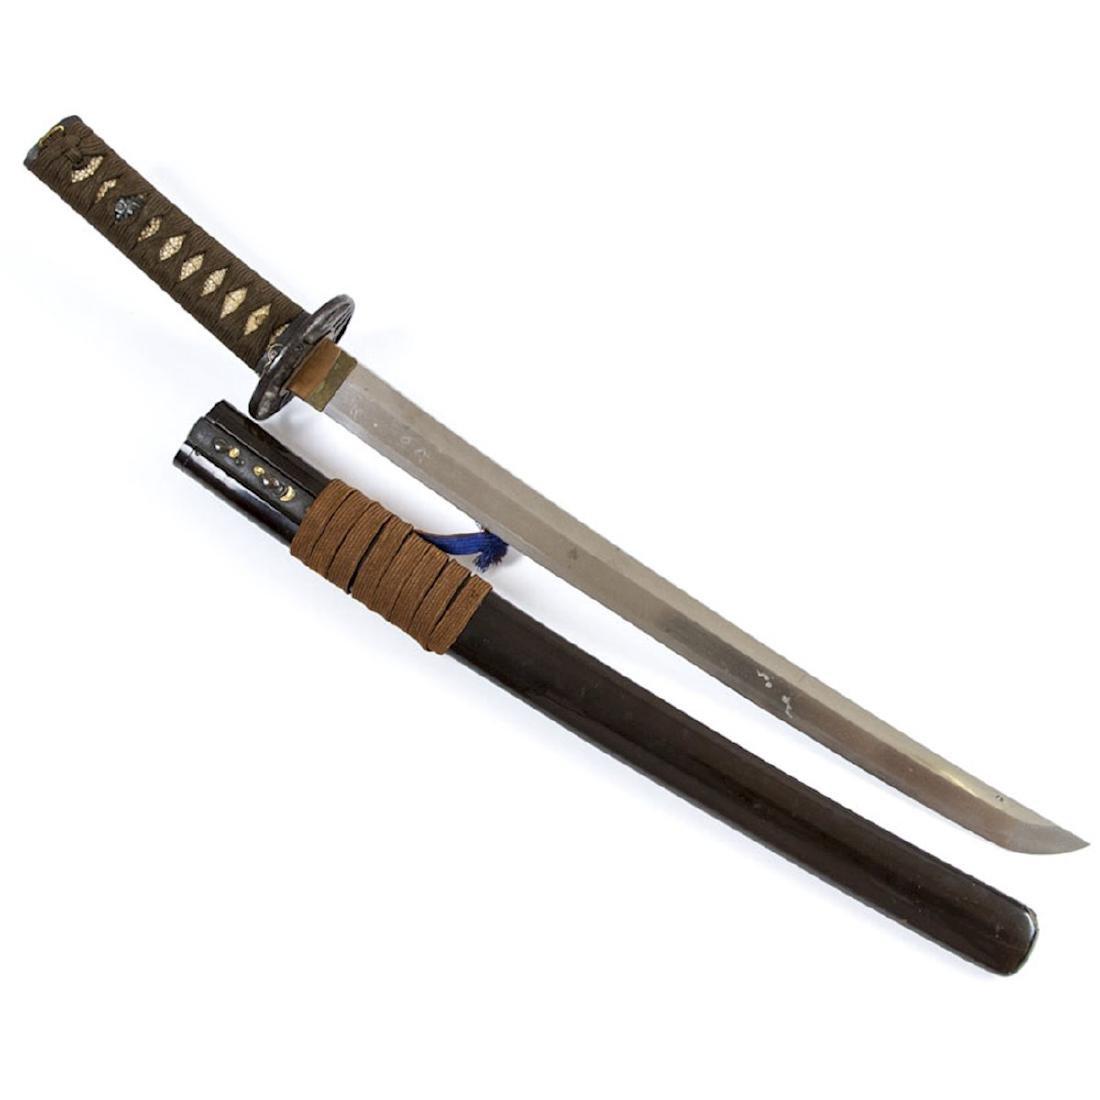 JAPANESE WAKIZASHI SWORD